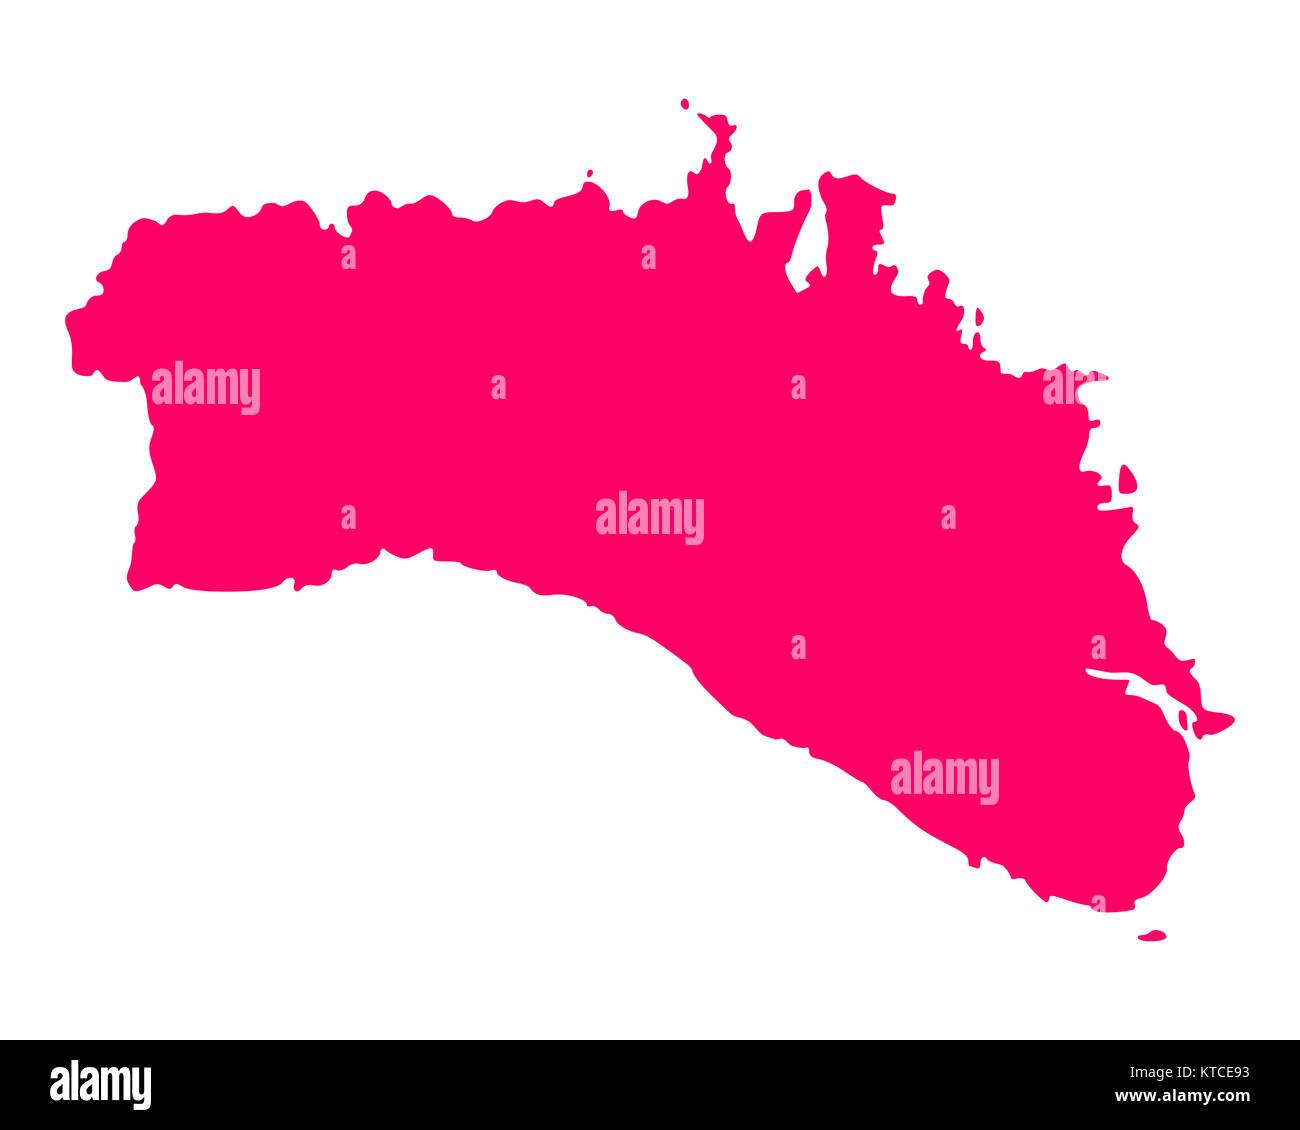 Karte von Menorca - Stock Image